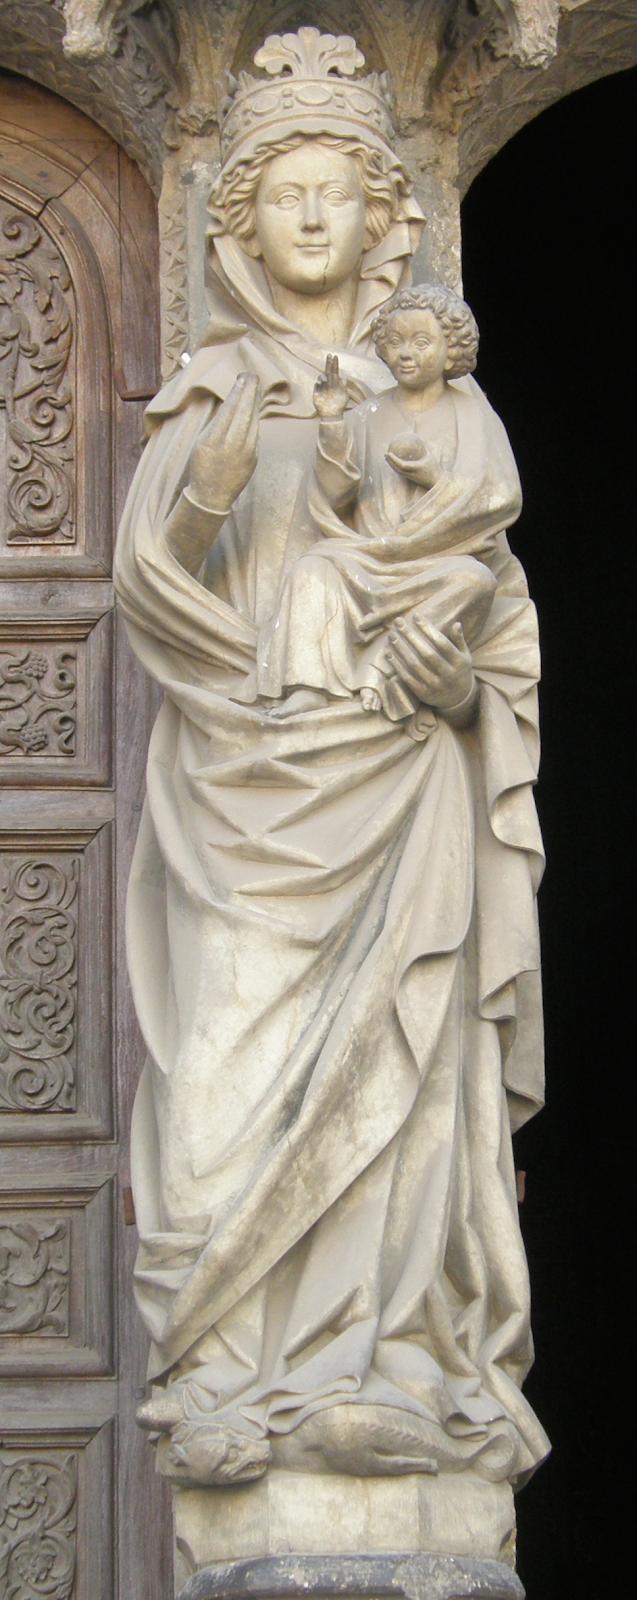 Virgen Blanca de la catedral de León.png